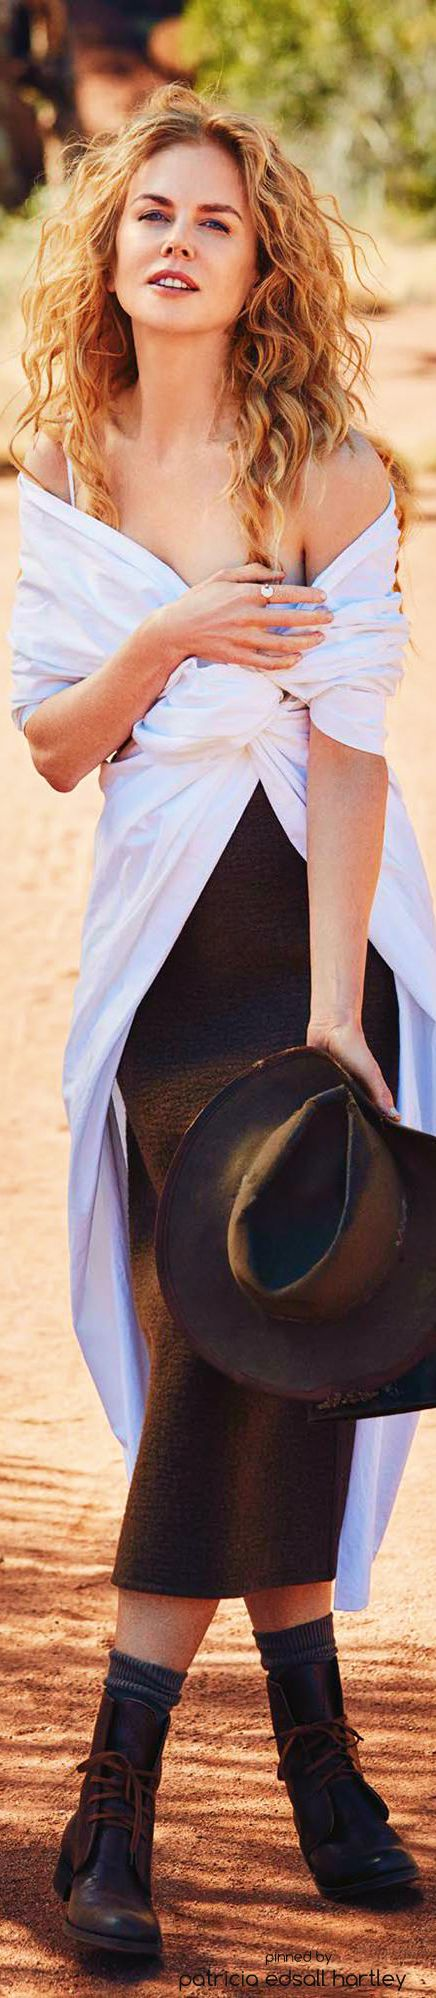 Nicole Kidman - Vogue Australia - Septemeber 2015